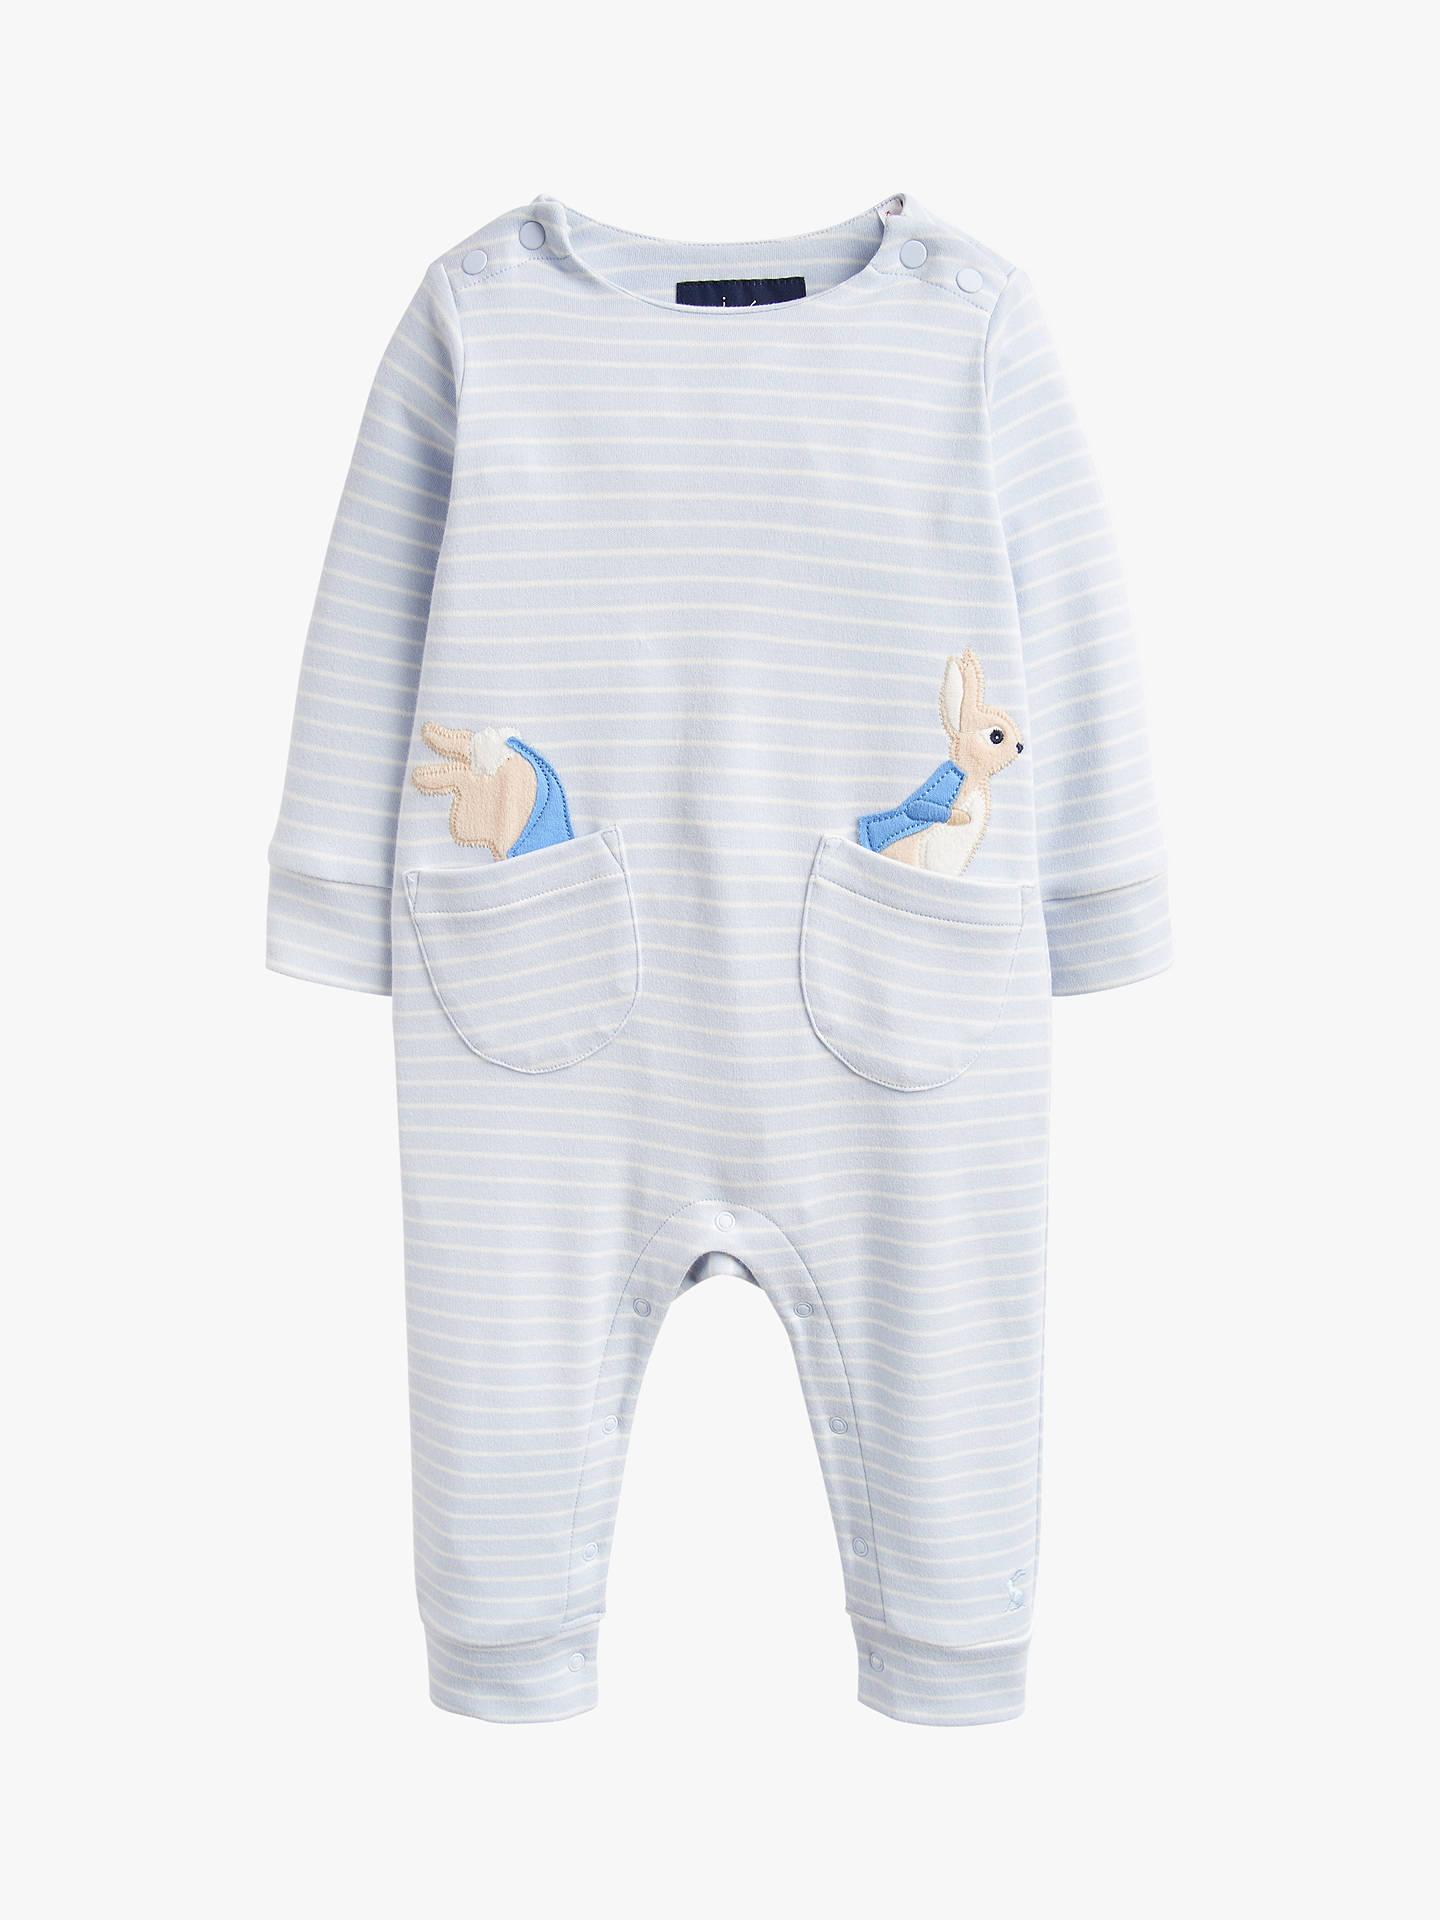 70beb8046aa78 Baby Joule Gracie Peter Rabbit Babygrow, Light Blue